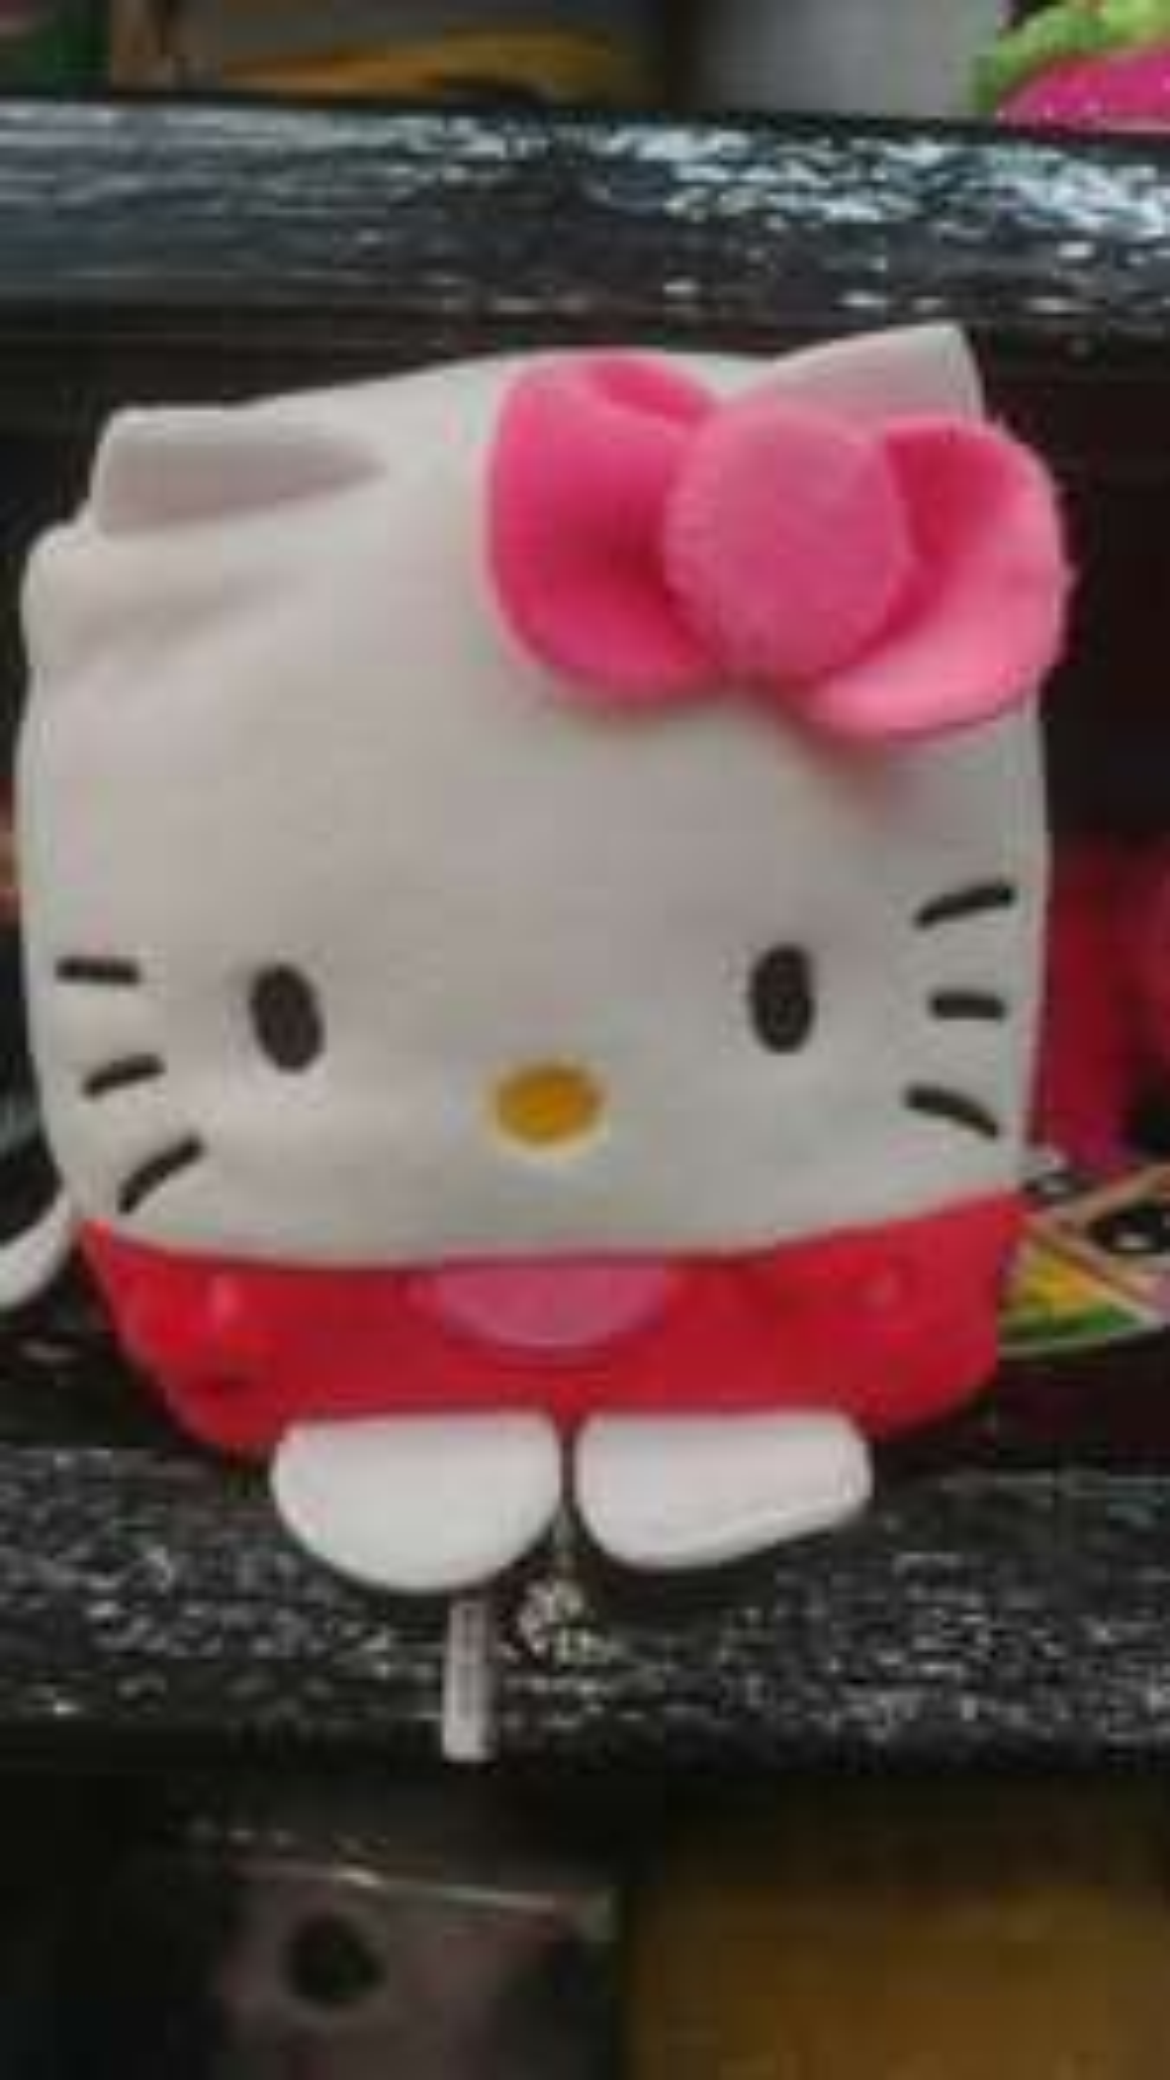 Walmart: Volvió Hello Kitty en forma de cubo